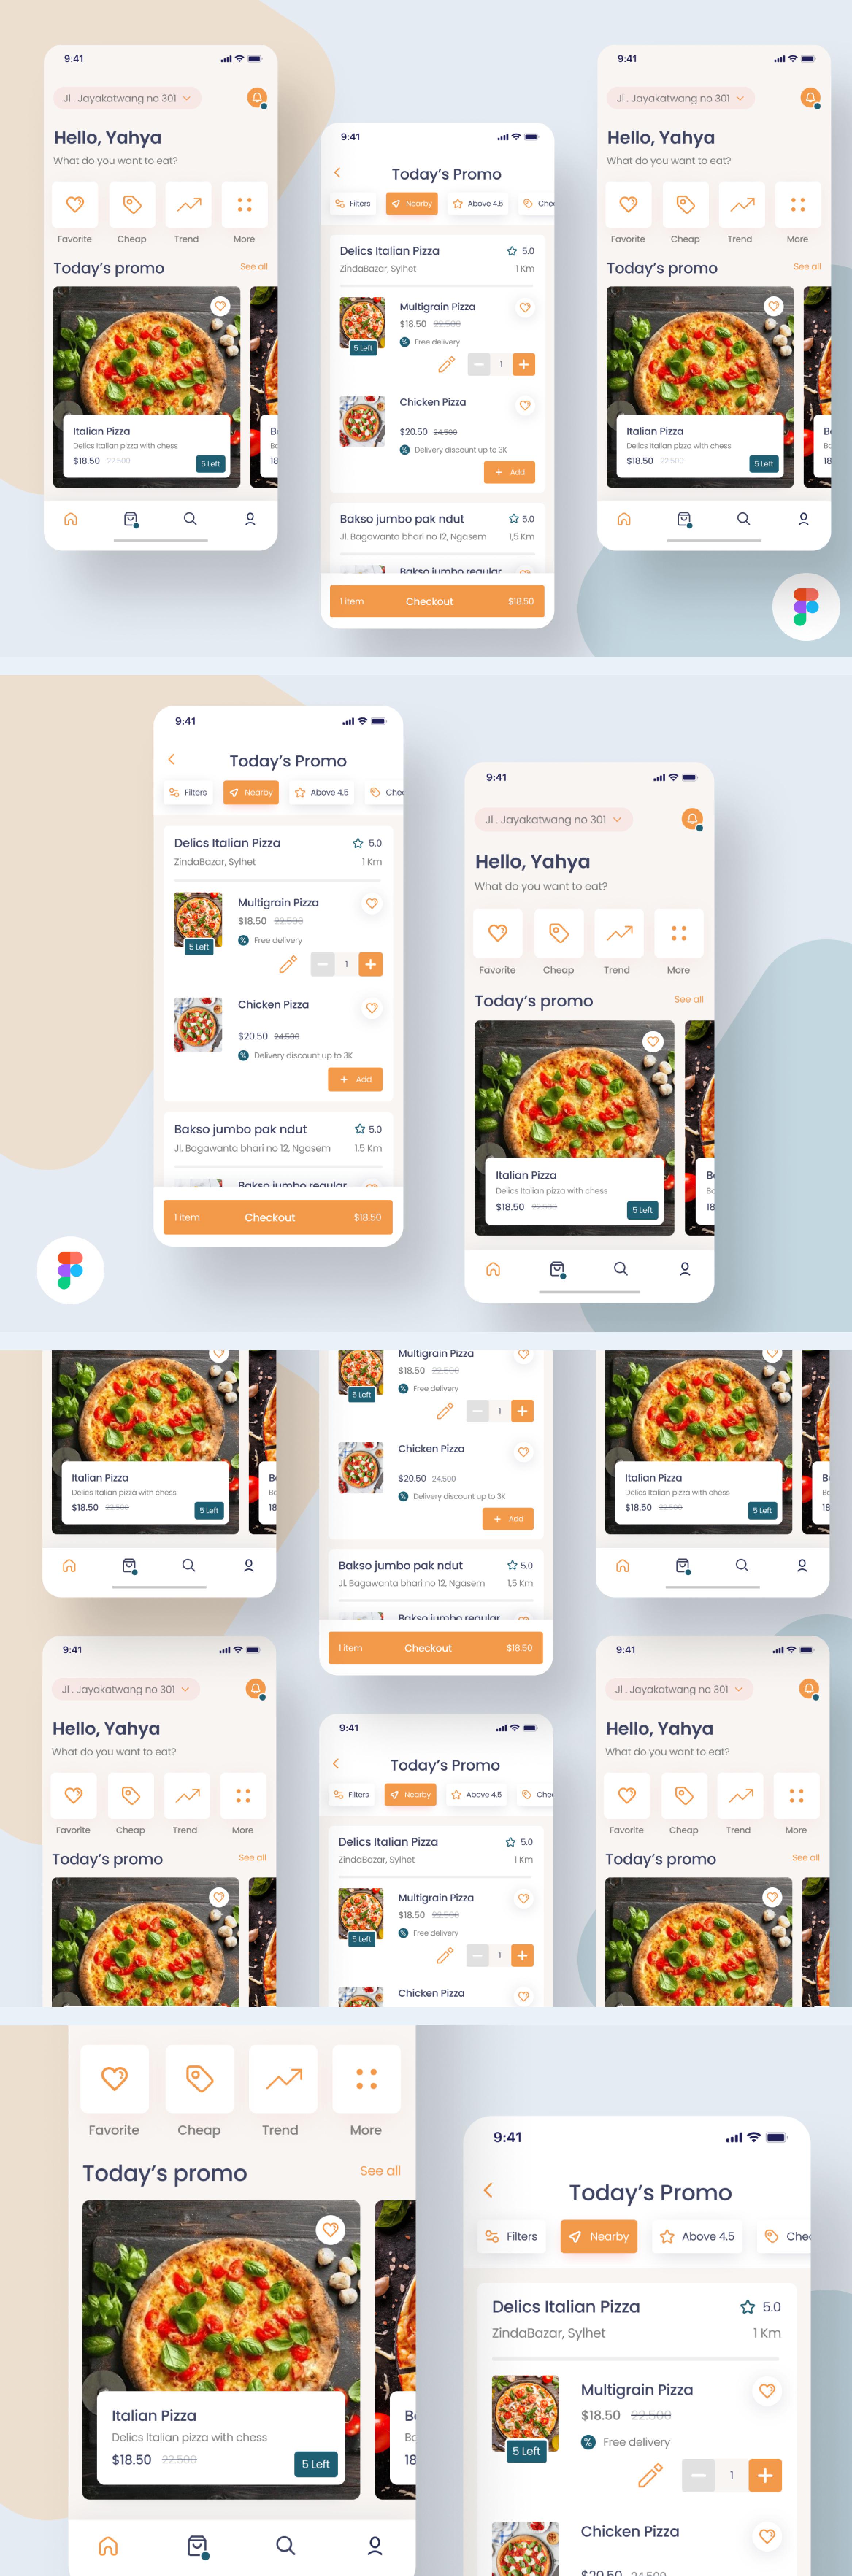 Online Pizza Delivery App UI Design